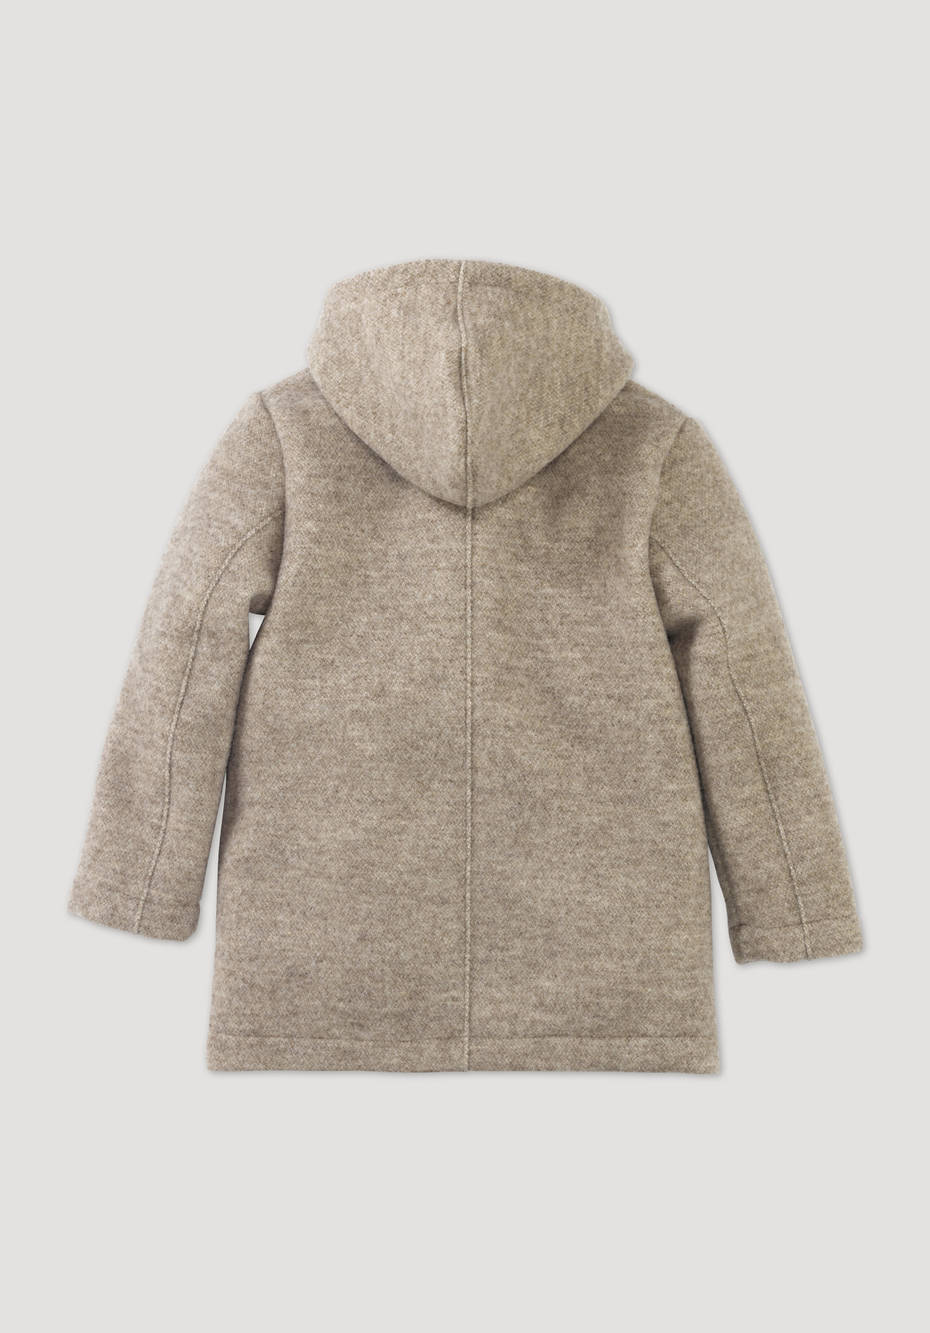 Rhön coat made of pure new wool